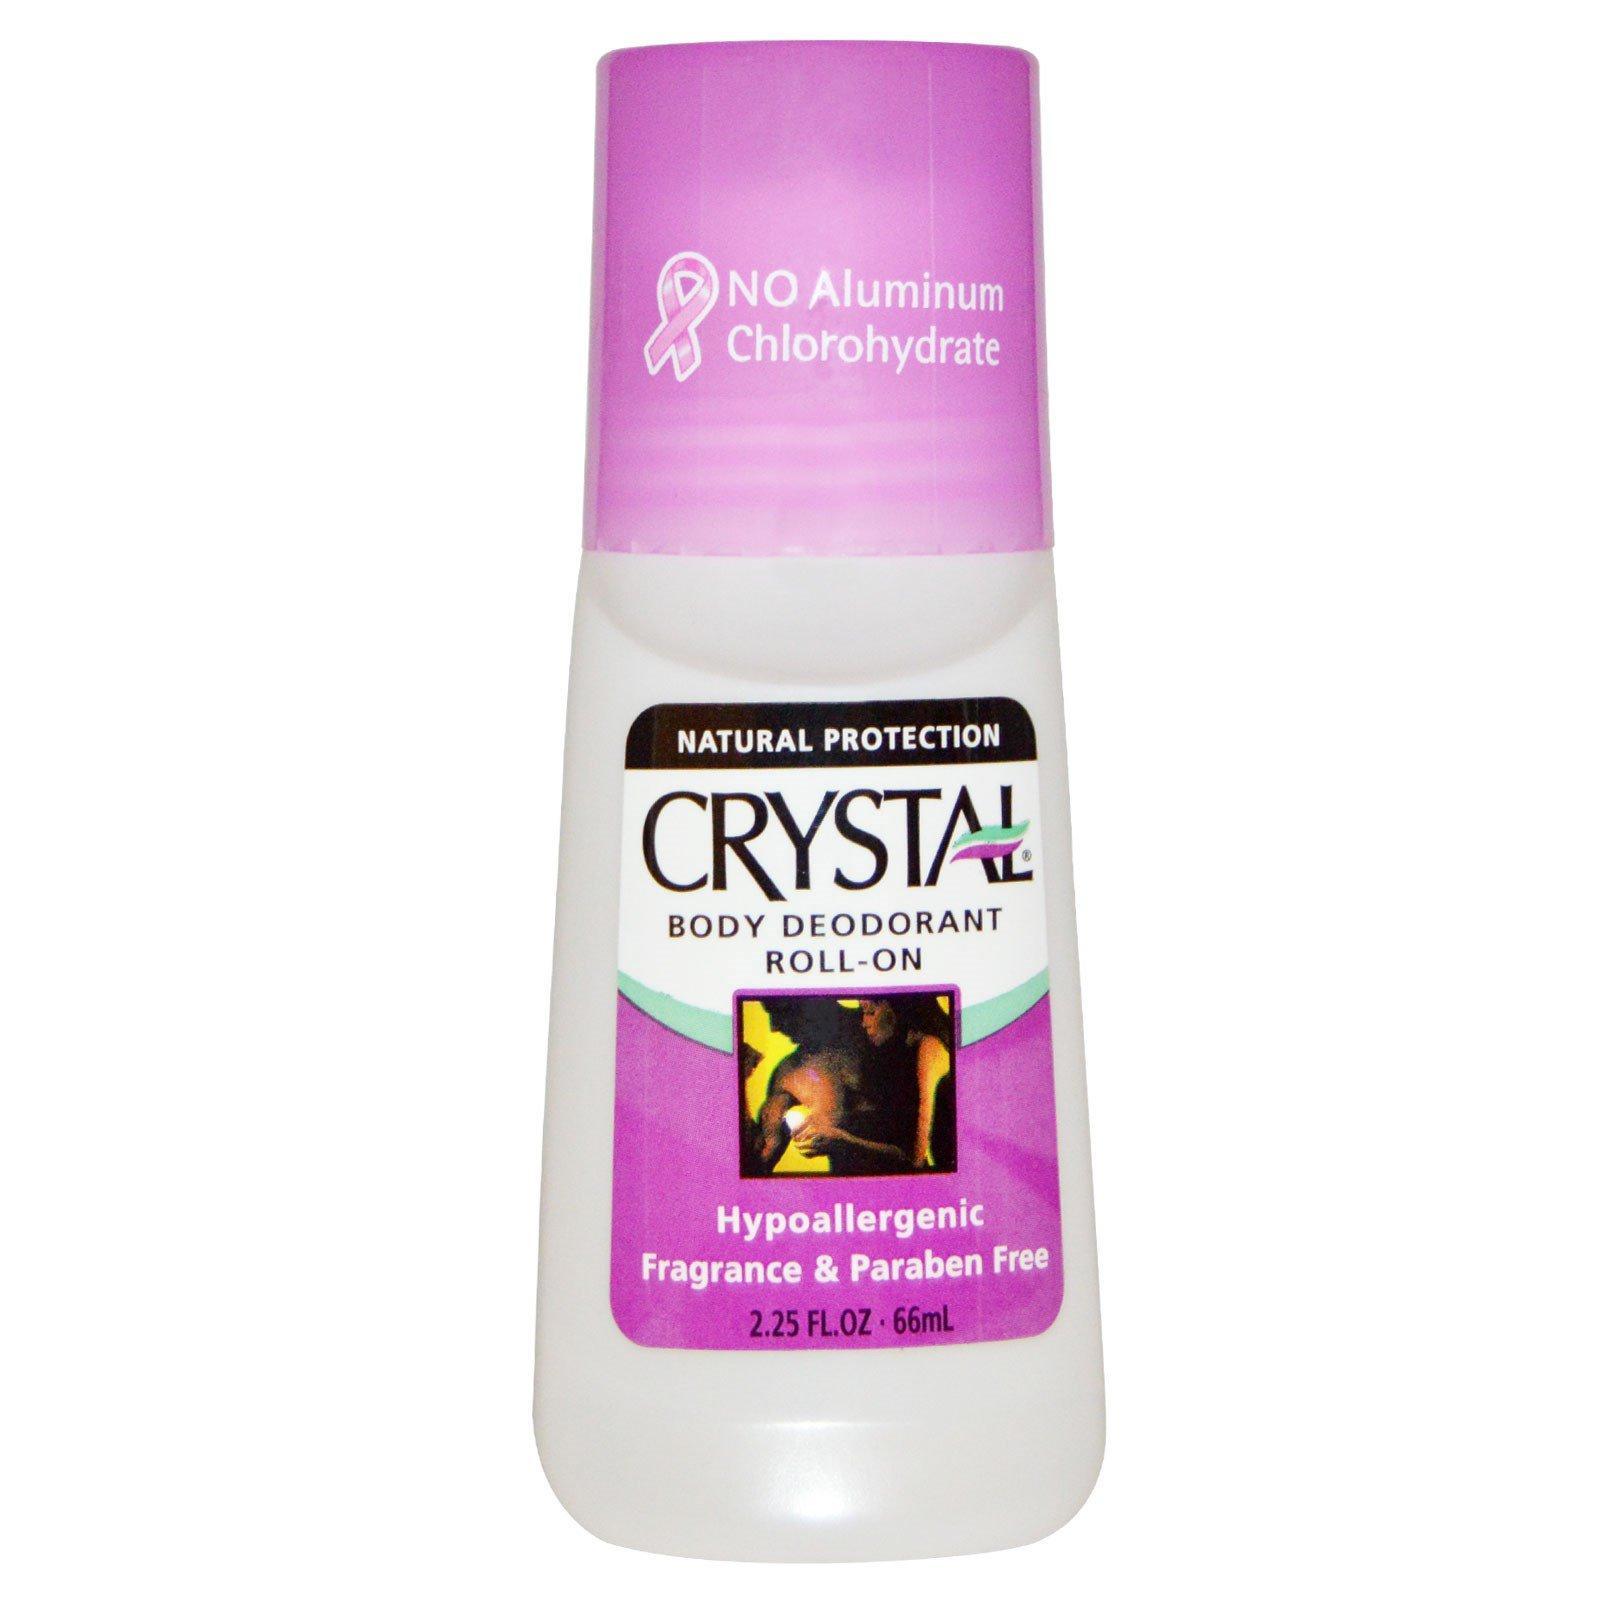 Crystal Body Deodorant, Шариковый дезодорант, 2.25 fl oz (66 мл)